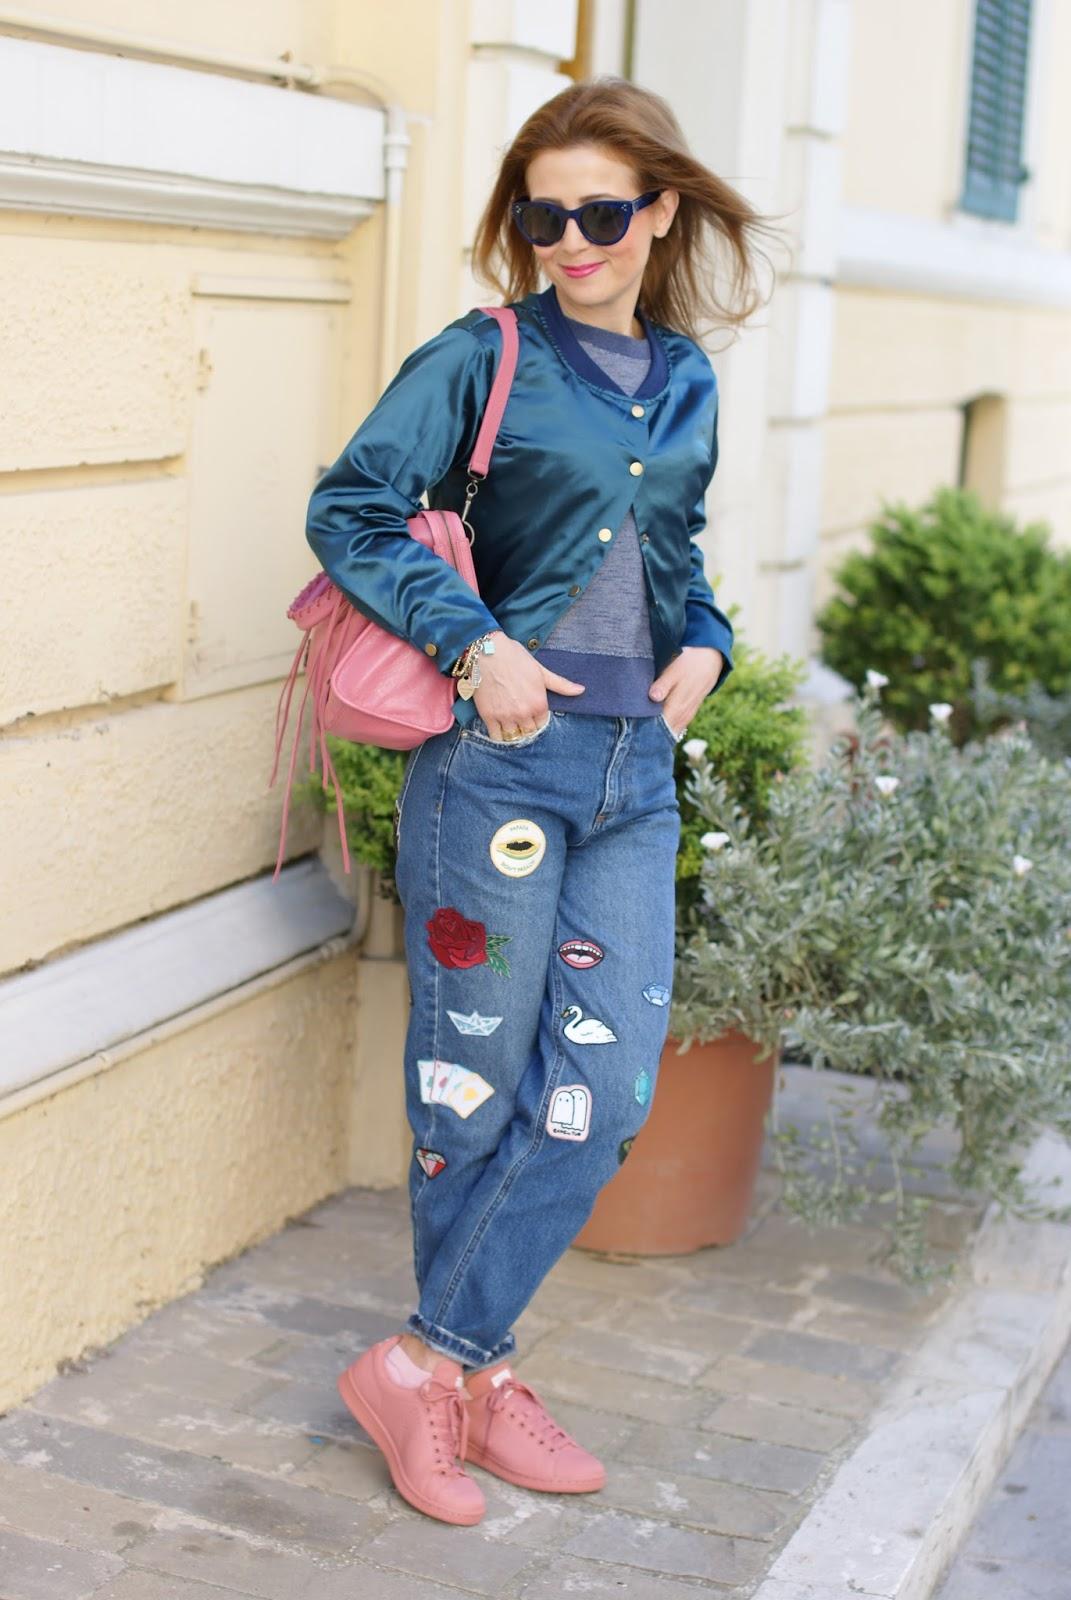 Raf Simons Stan Smith Outfit | adidas by raf simons stan